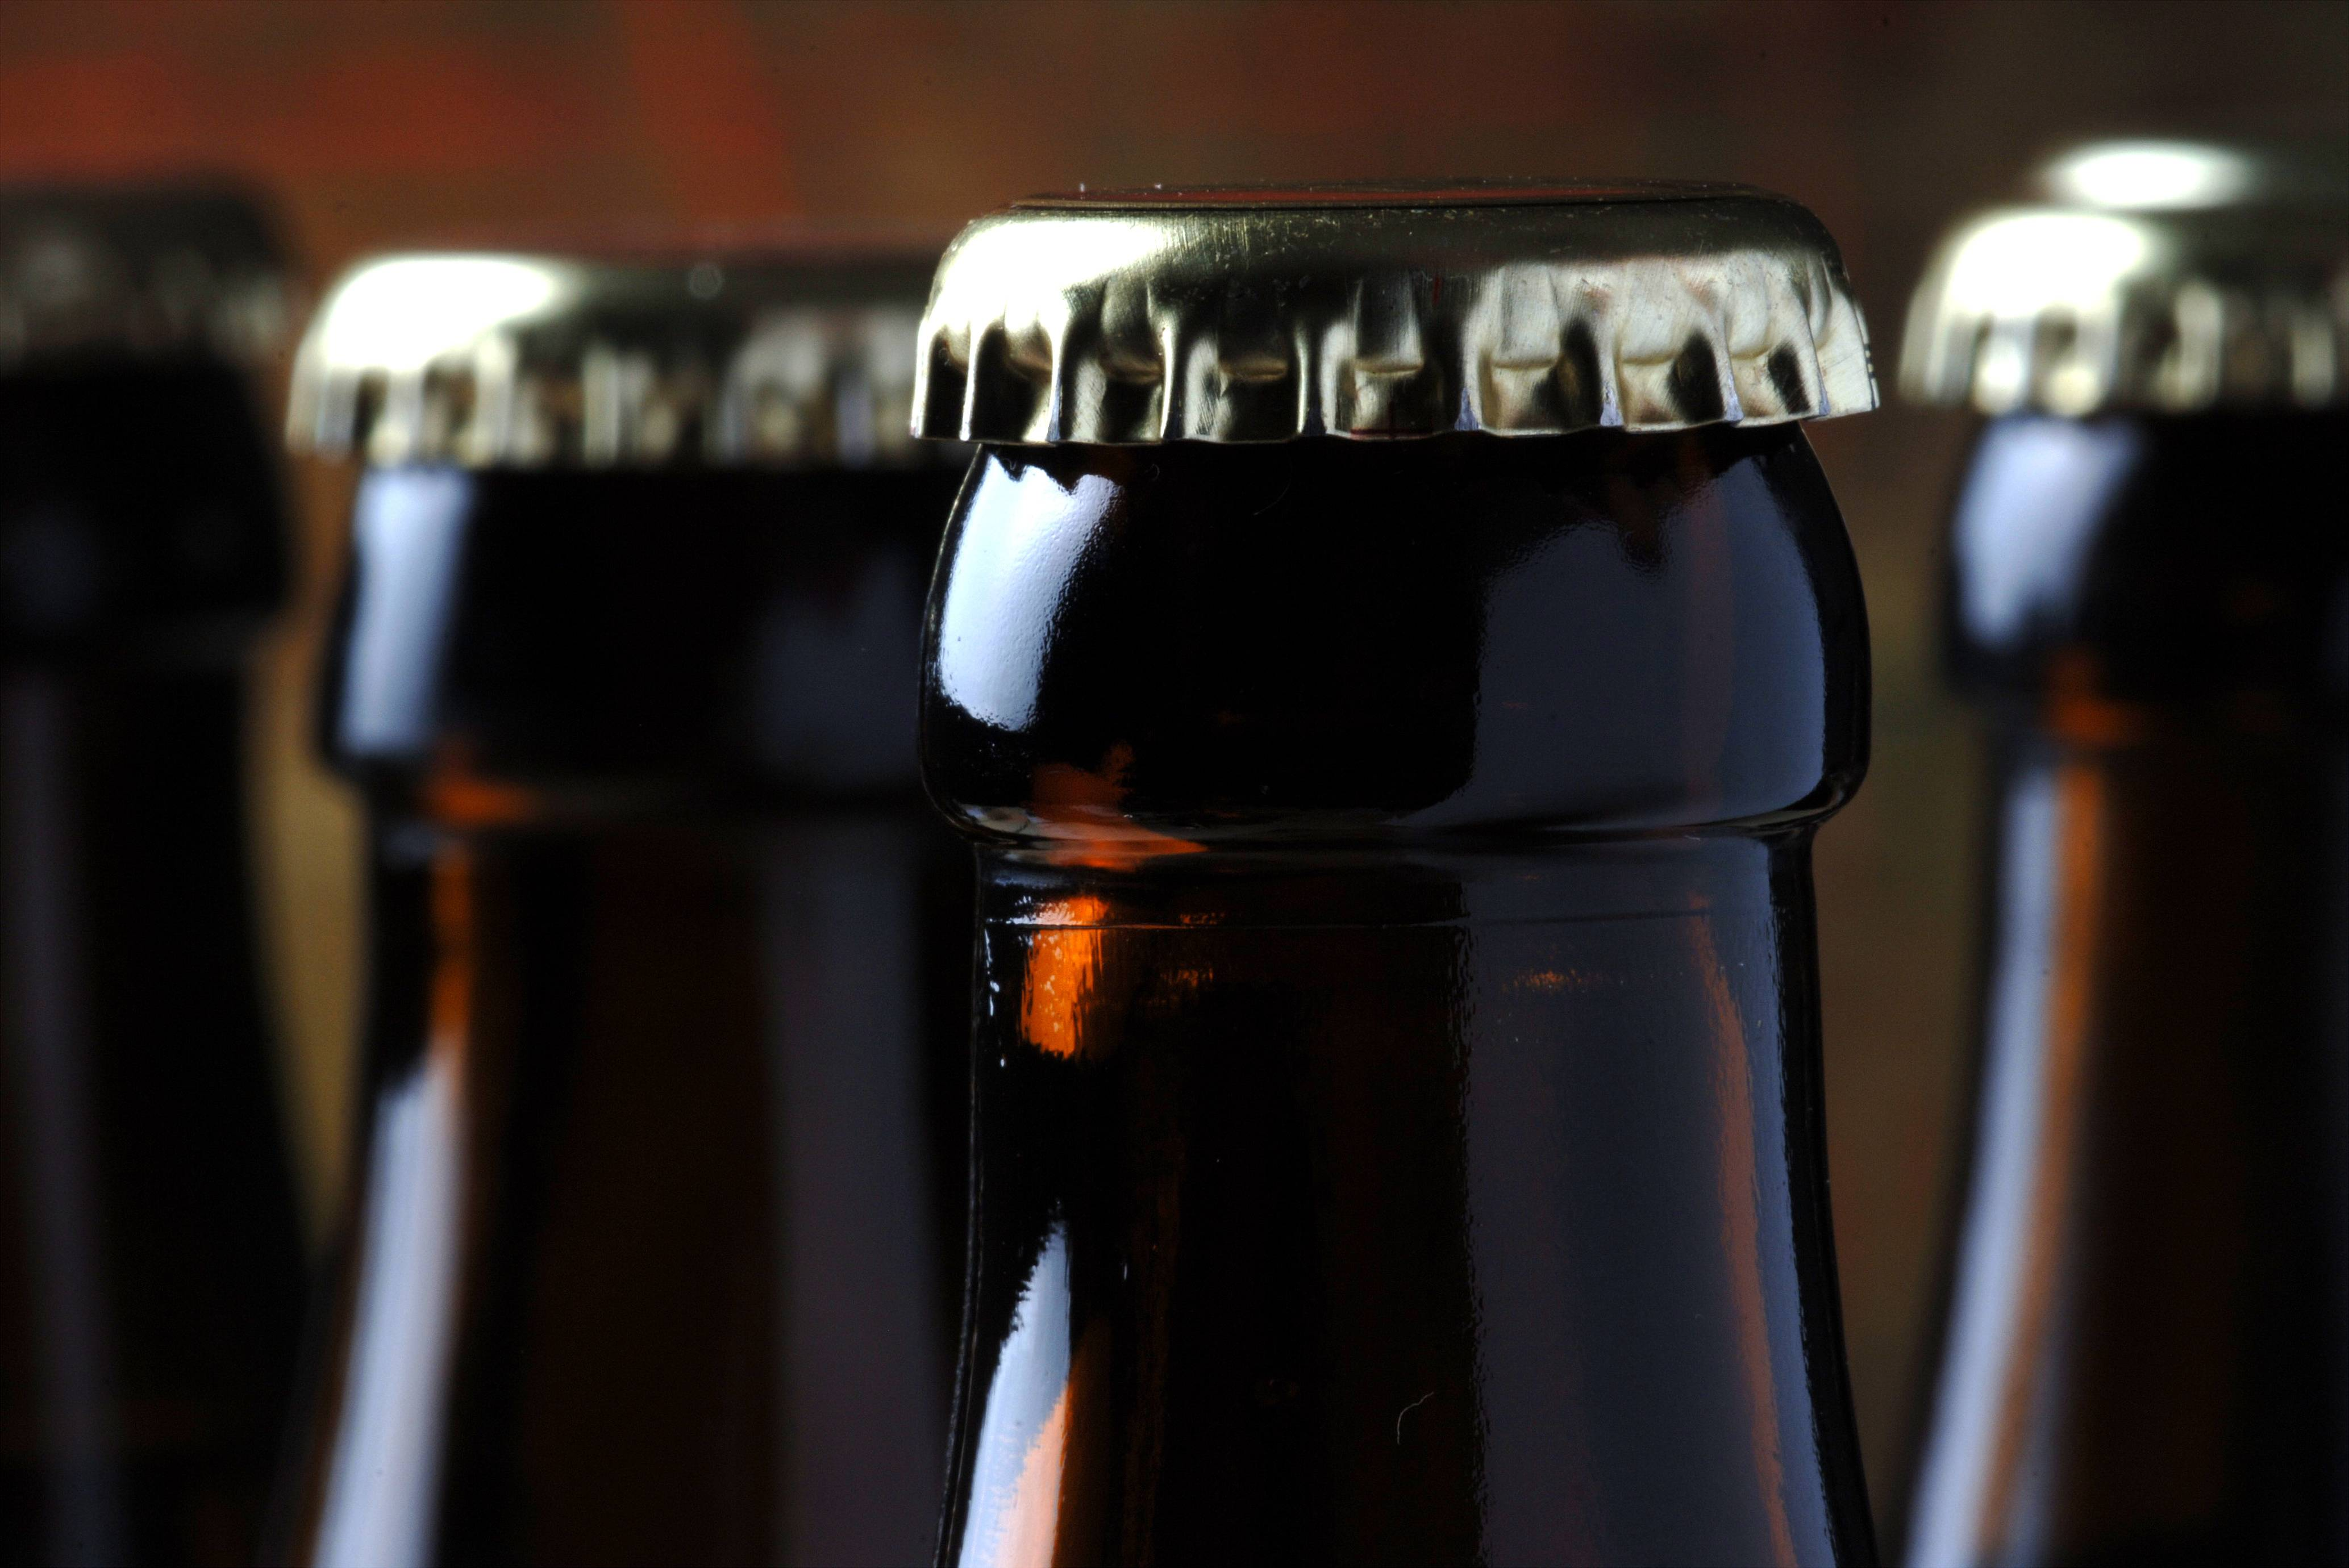 Macht alkoholfreies Bier betrunken? | besserhaushalten